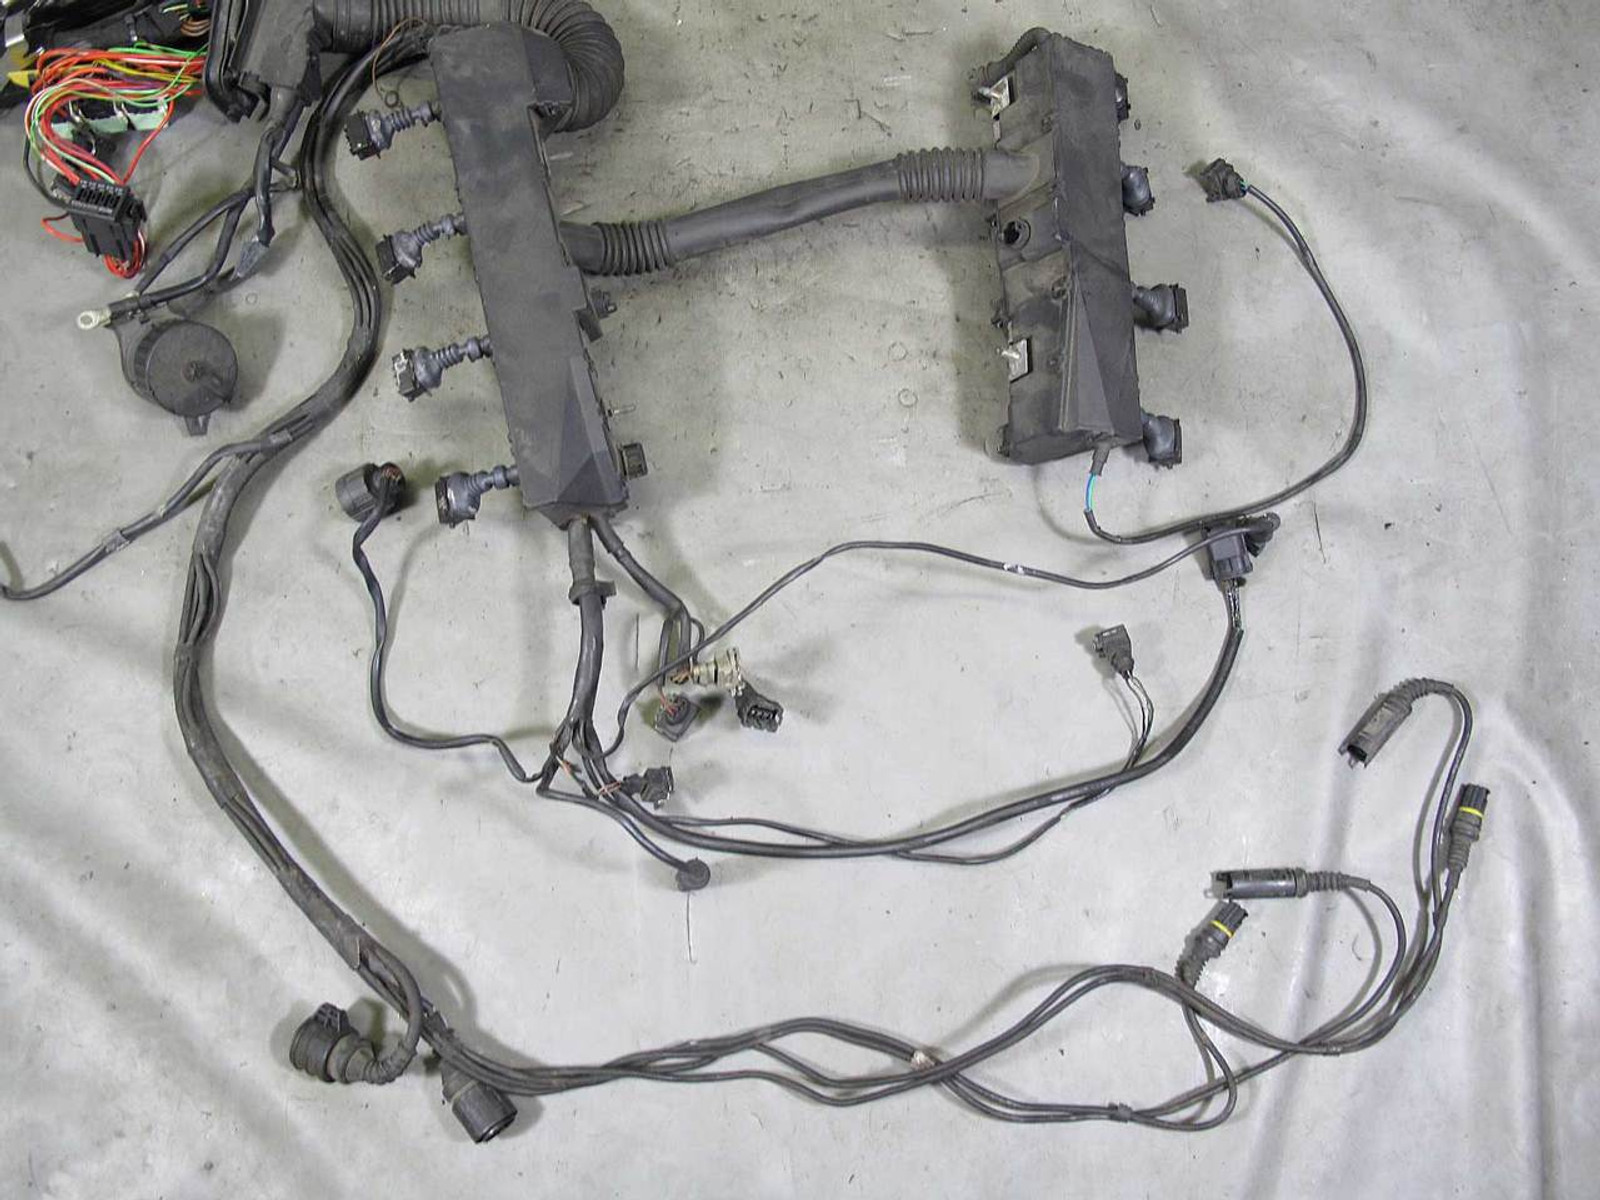 medium resolution of bmw 740il engine wiring harness wiring diagram bmw 740il engine wiring harness